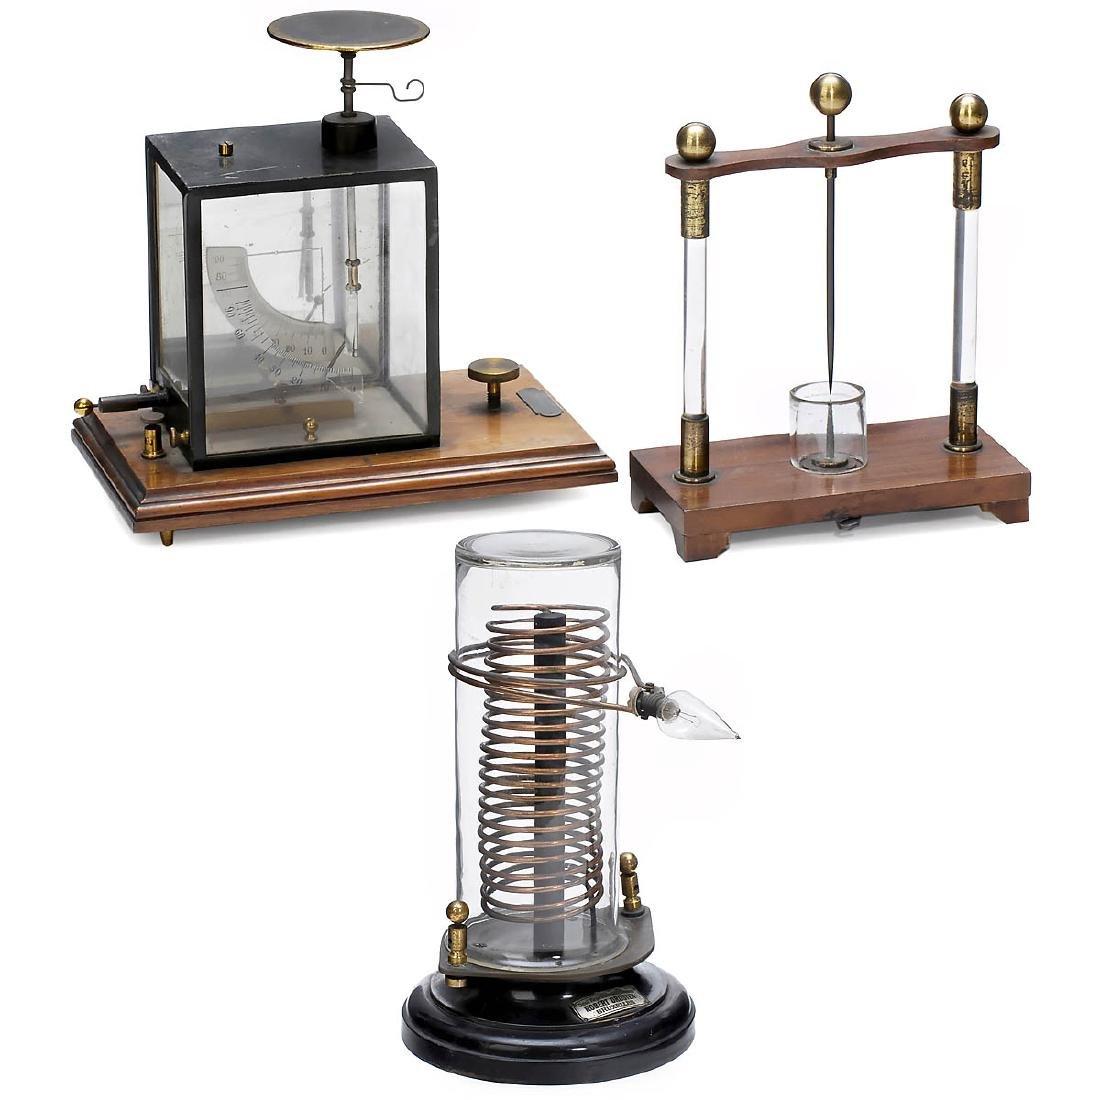 3 Electro-Physical Demonstration Models, c. 1915